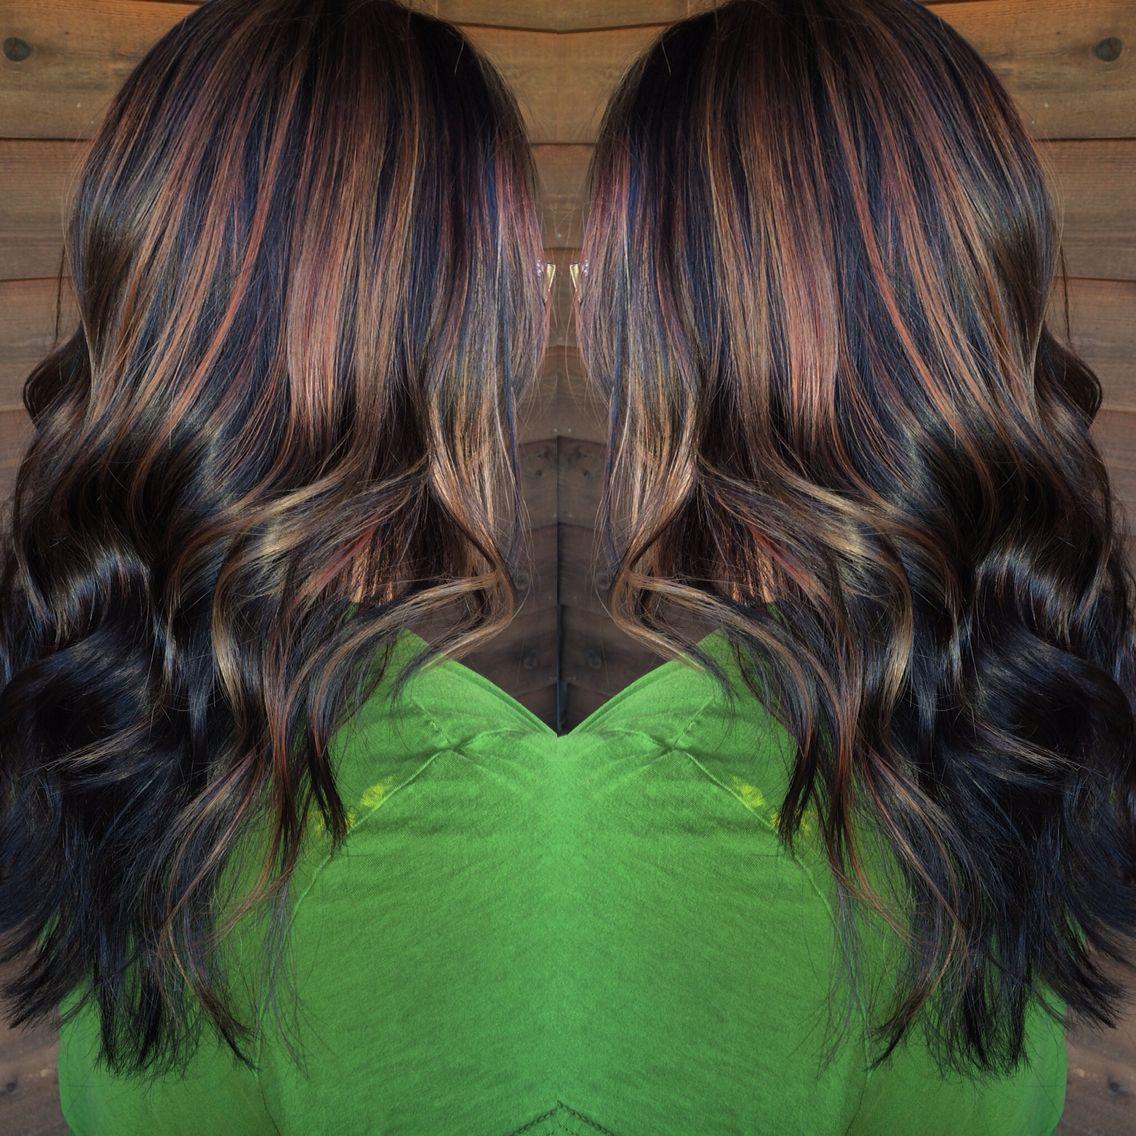 Dark Brown Hair Color With Halo Caramel Highlights Balayage Hair Hair Color